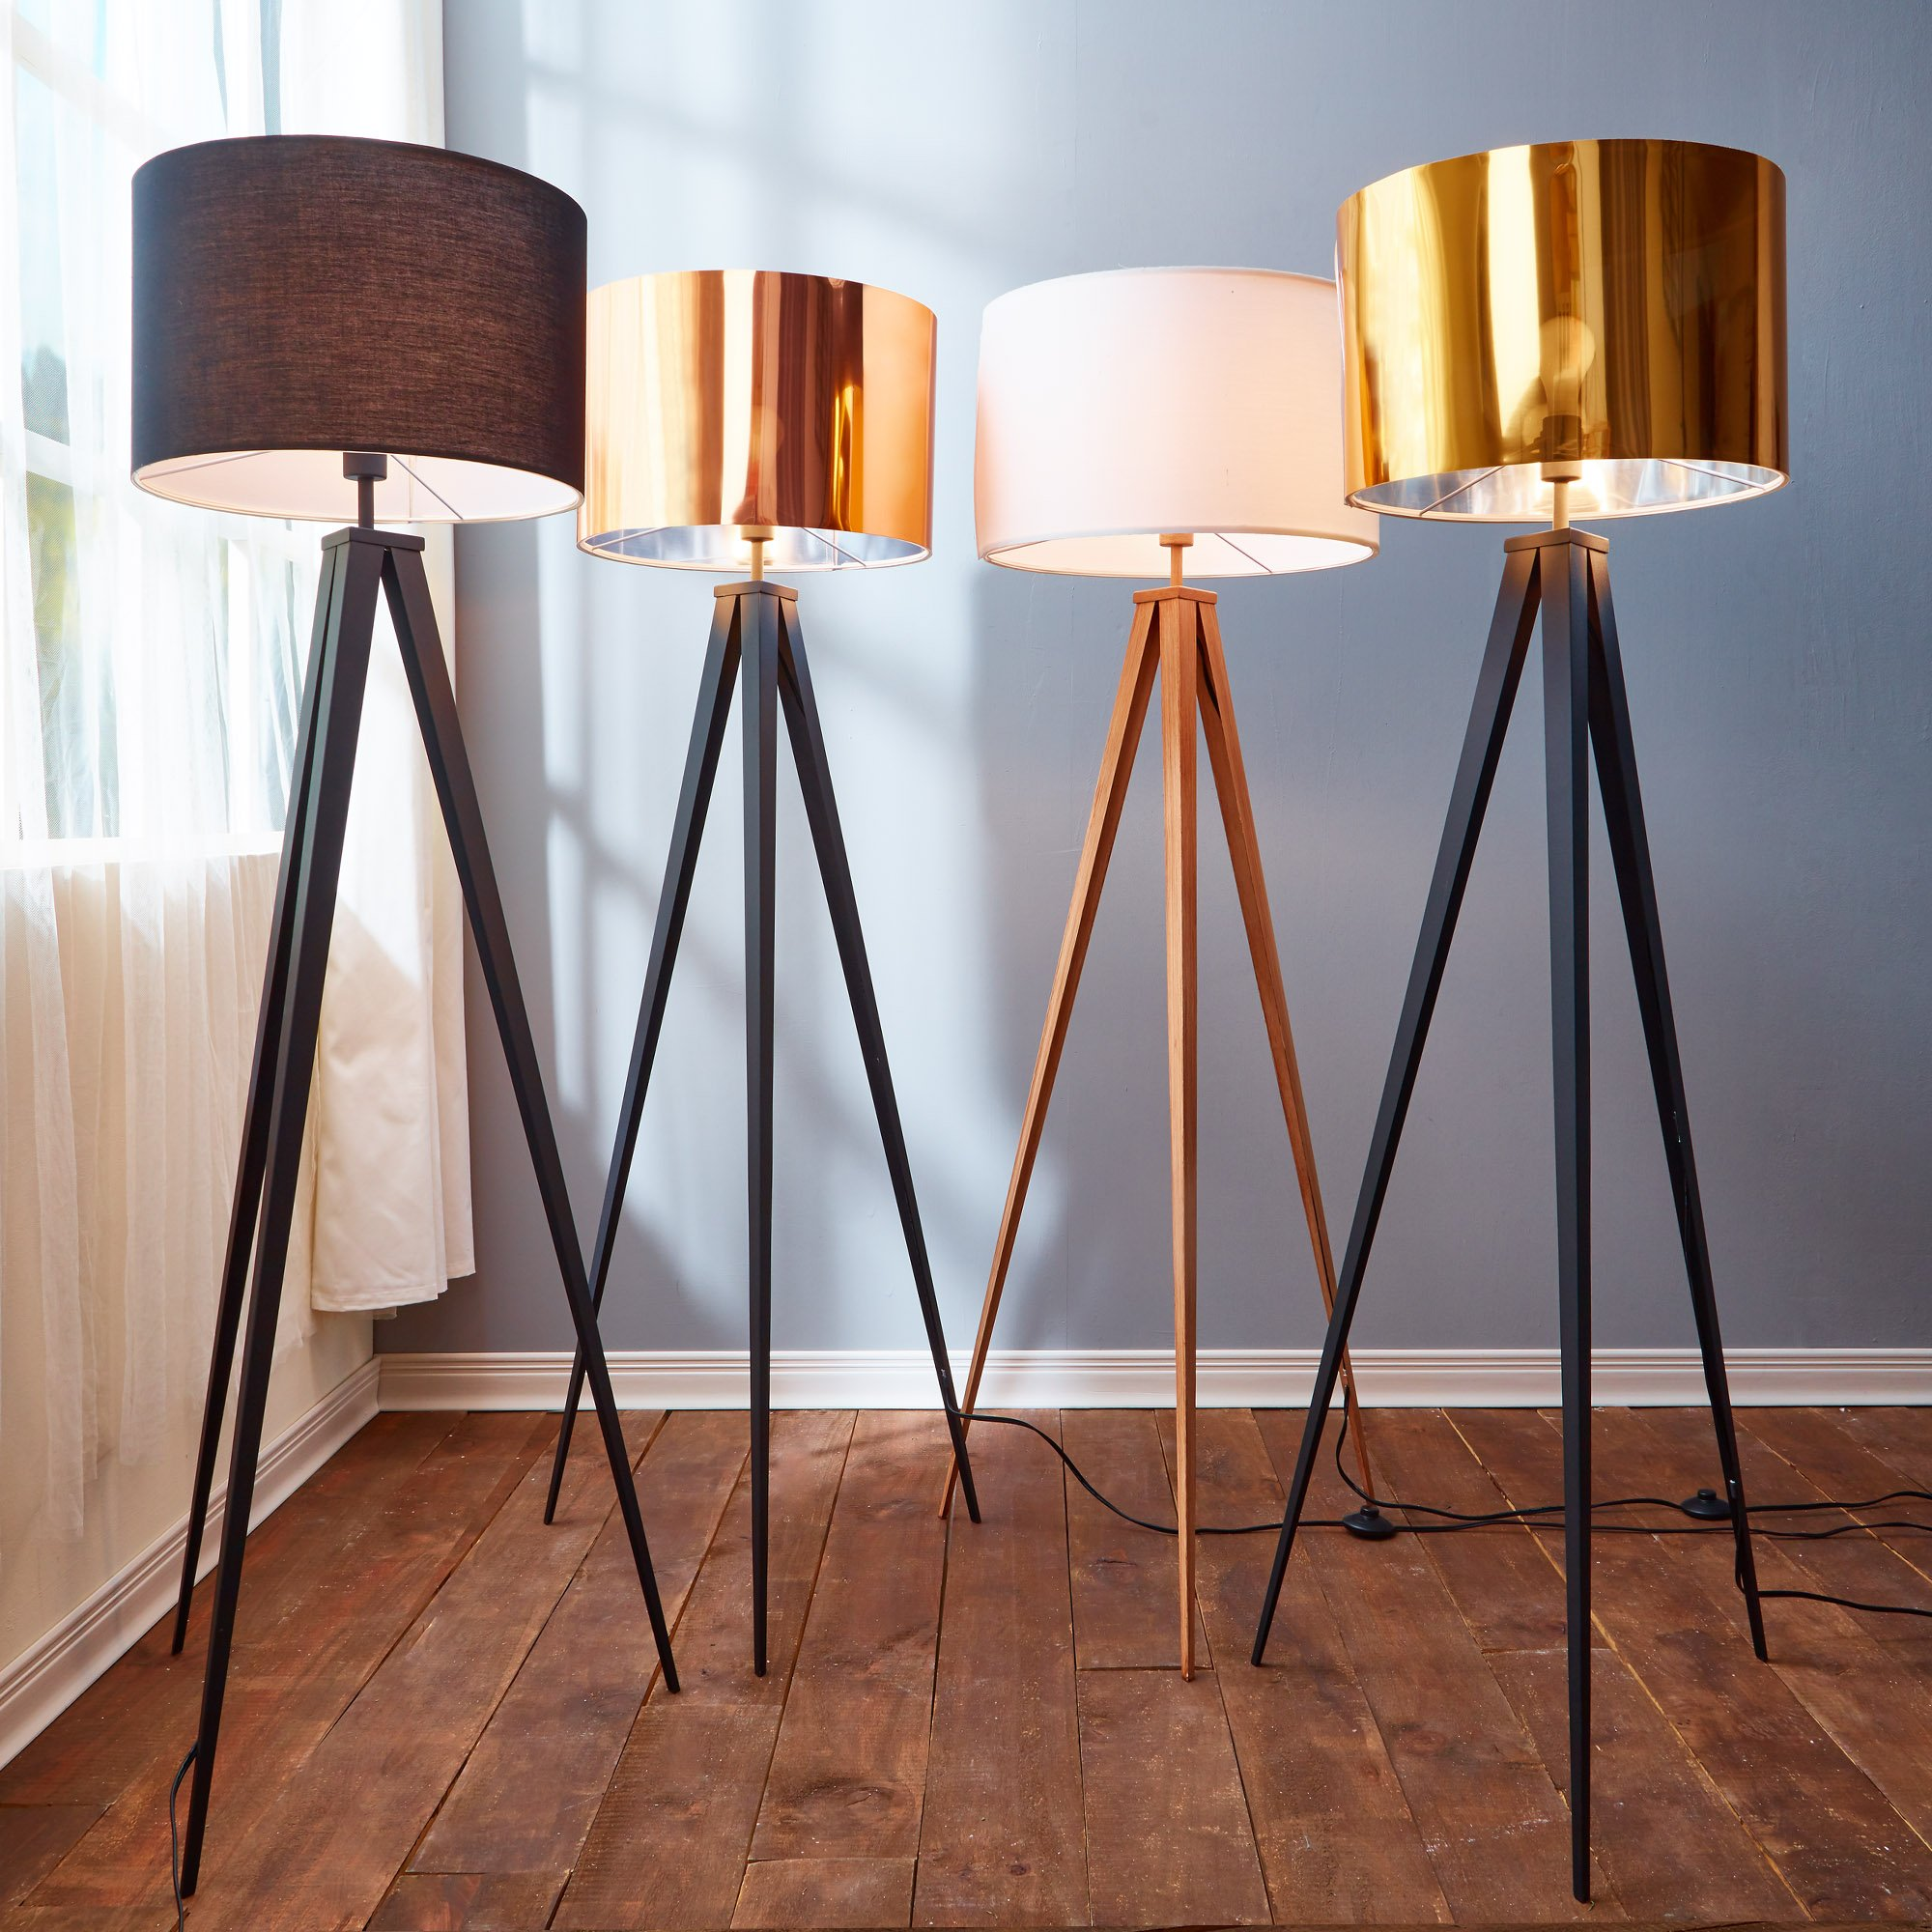 Versanora VN-L00007 Romanza Tripod Floor Lamp, White/Faux wooden leg by Versanora (Image #3)